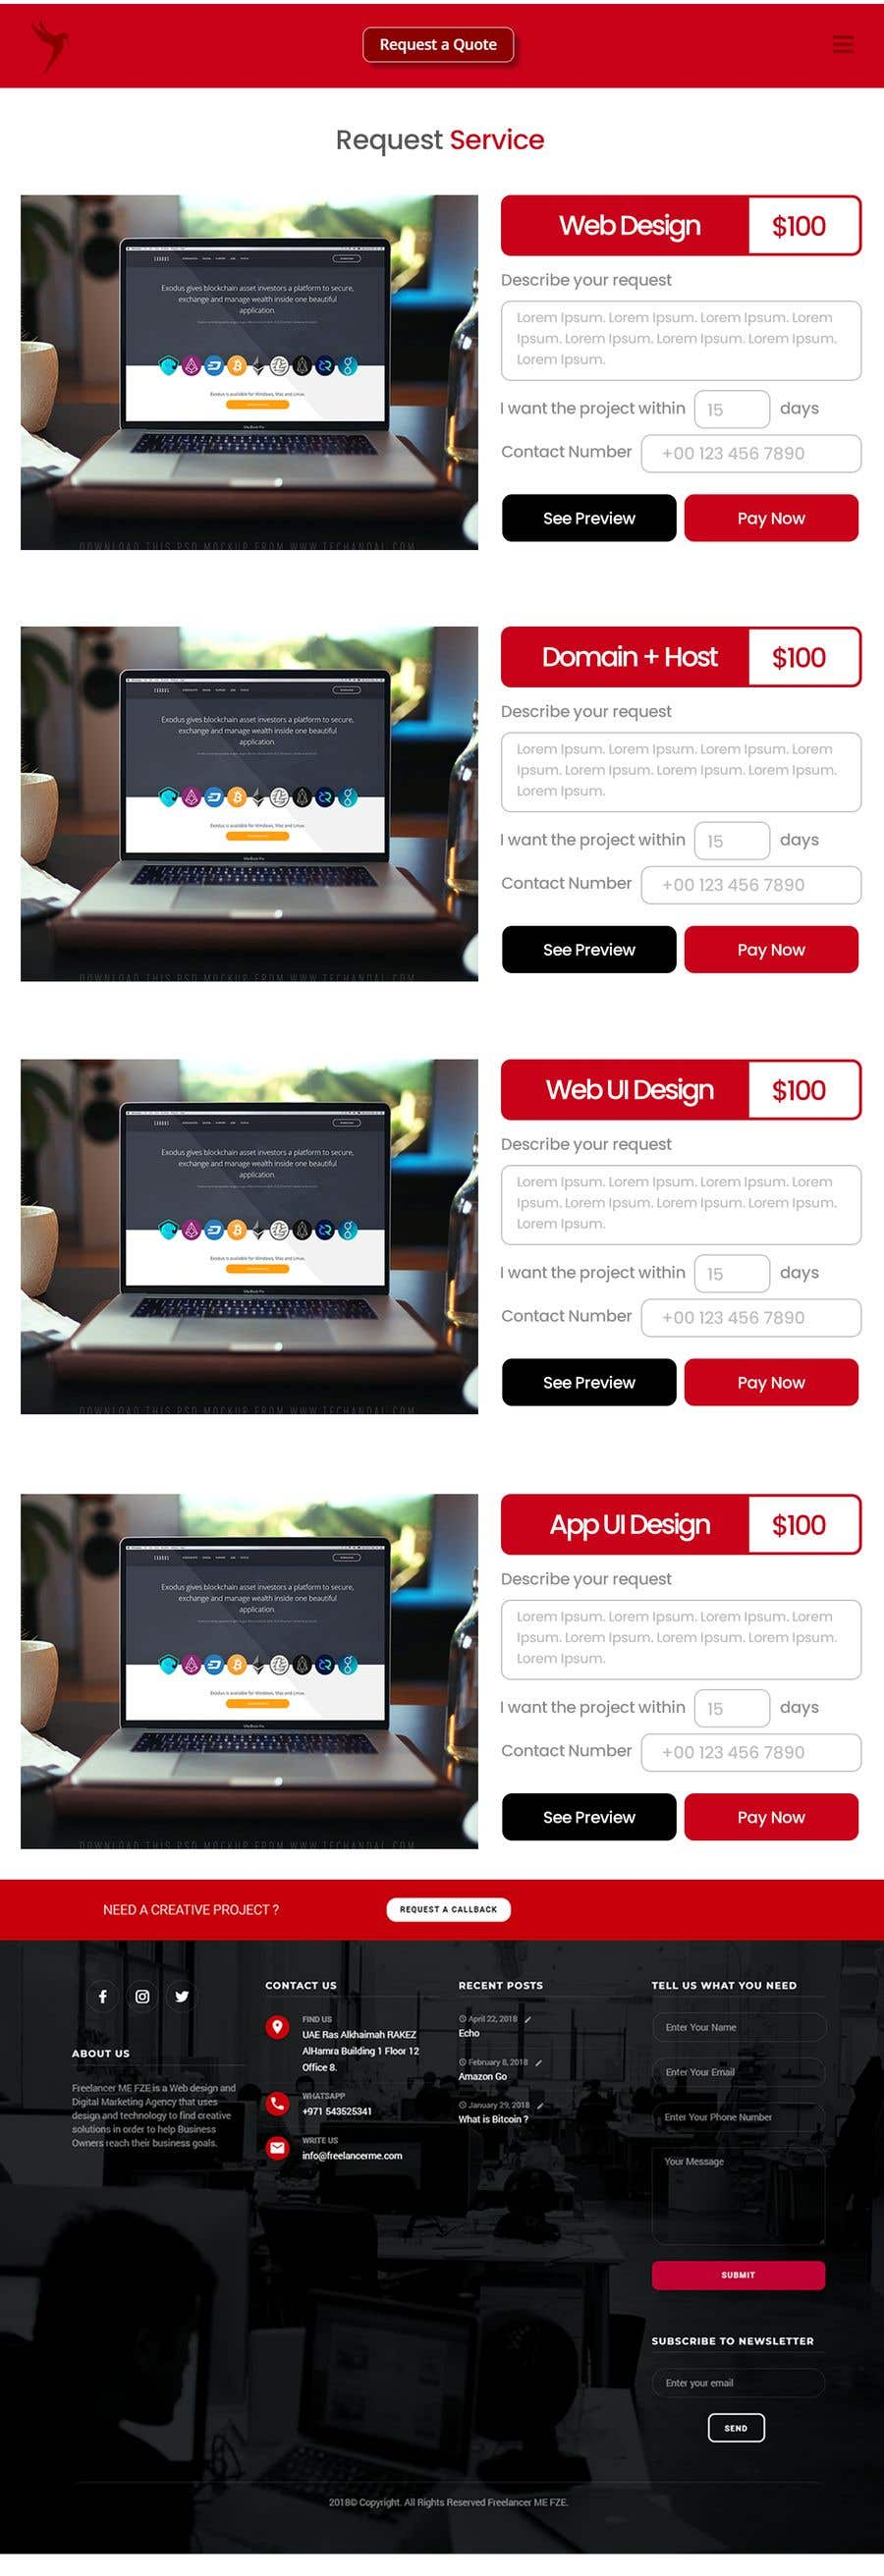 Penyertaan Peraduan #3 untuk UI design to generate e commerce section in Home page